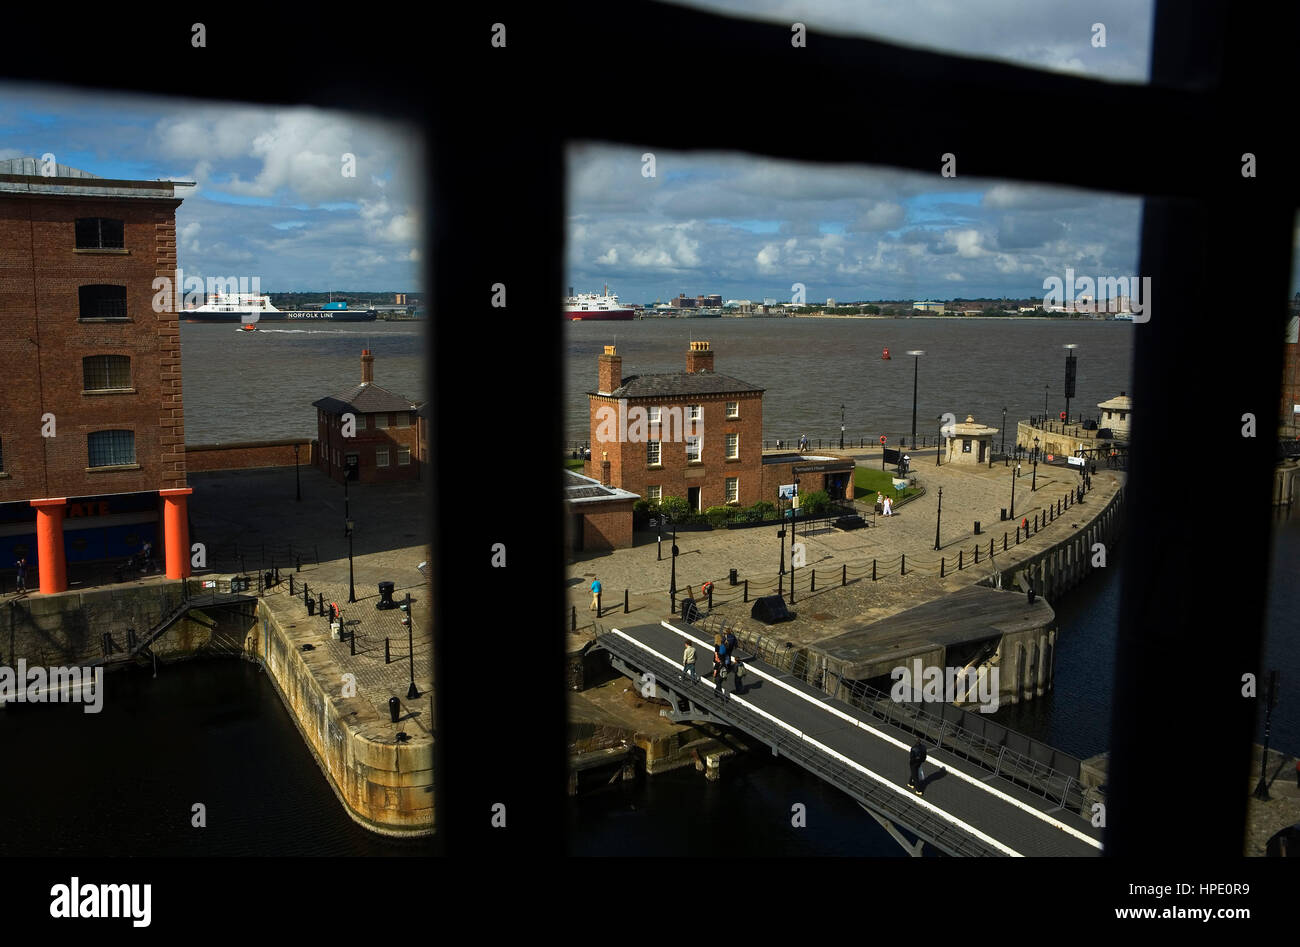 Albert Dock and Mersey river.Liverpool. England. UK - Stock Image